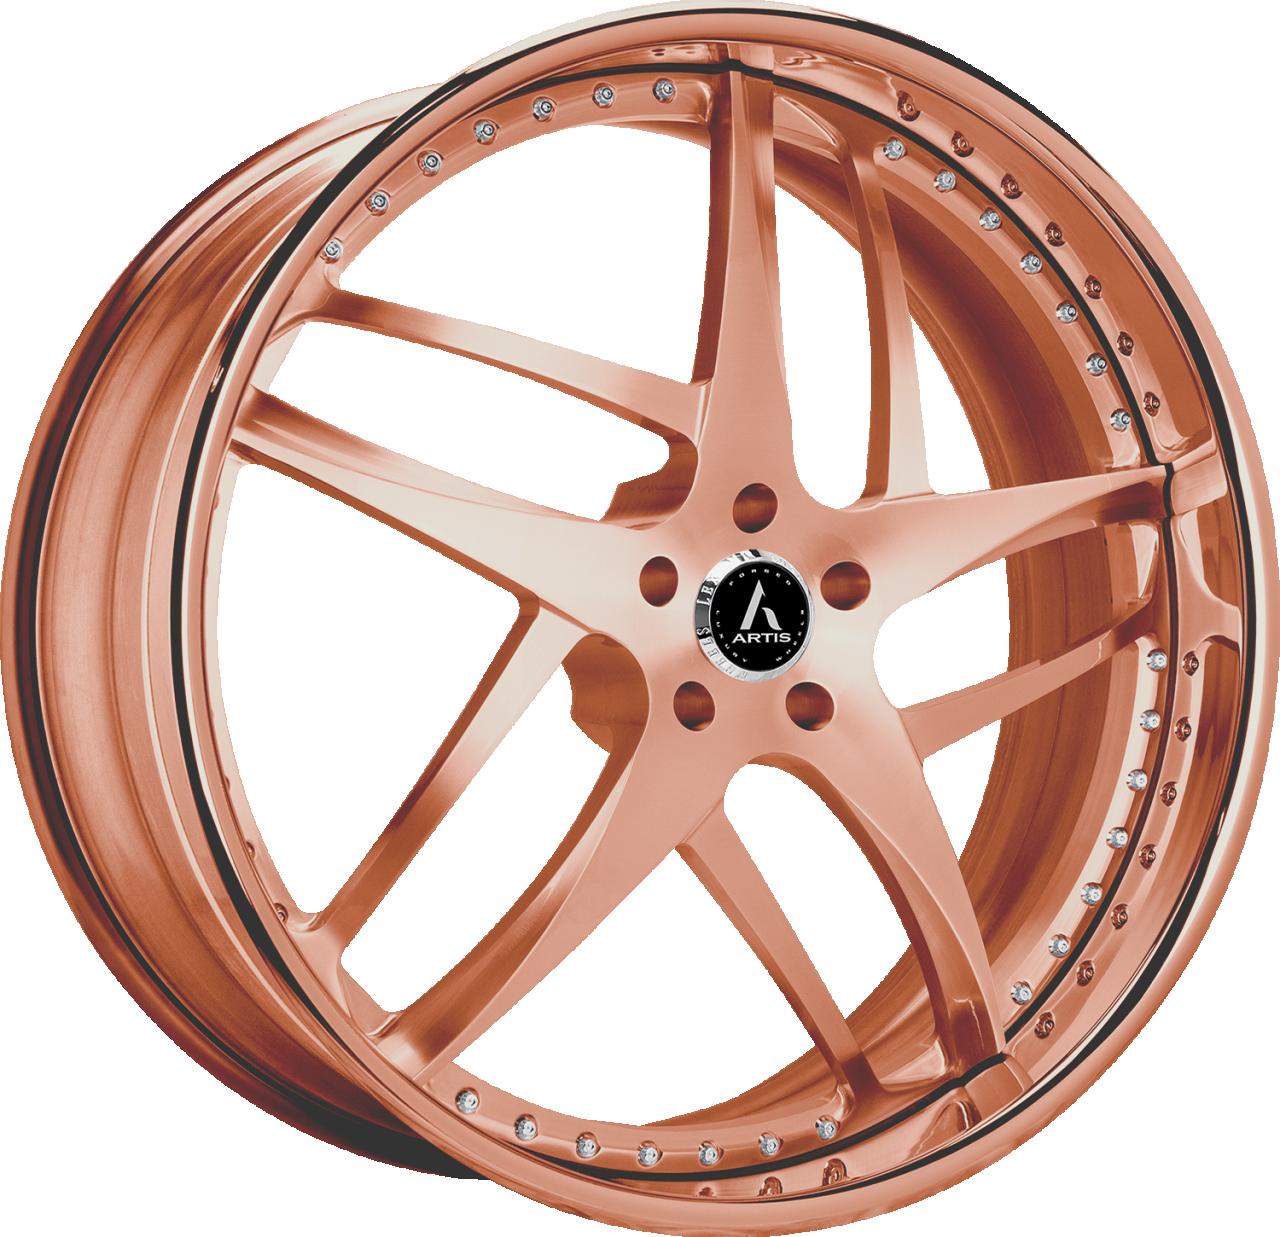 Artis Forged Bavaria wheel with Custom Rose Gold finish